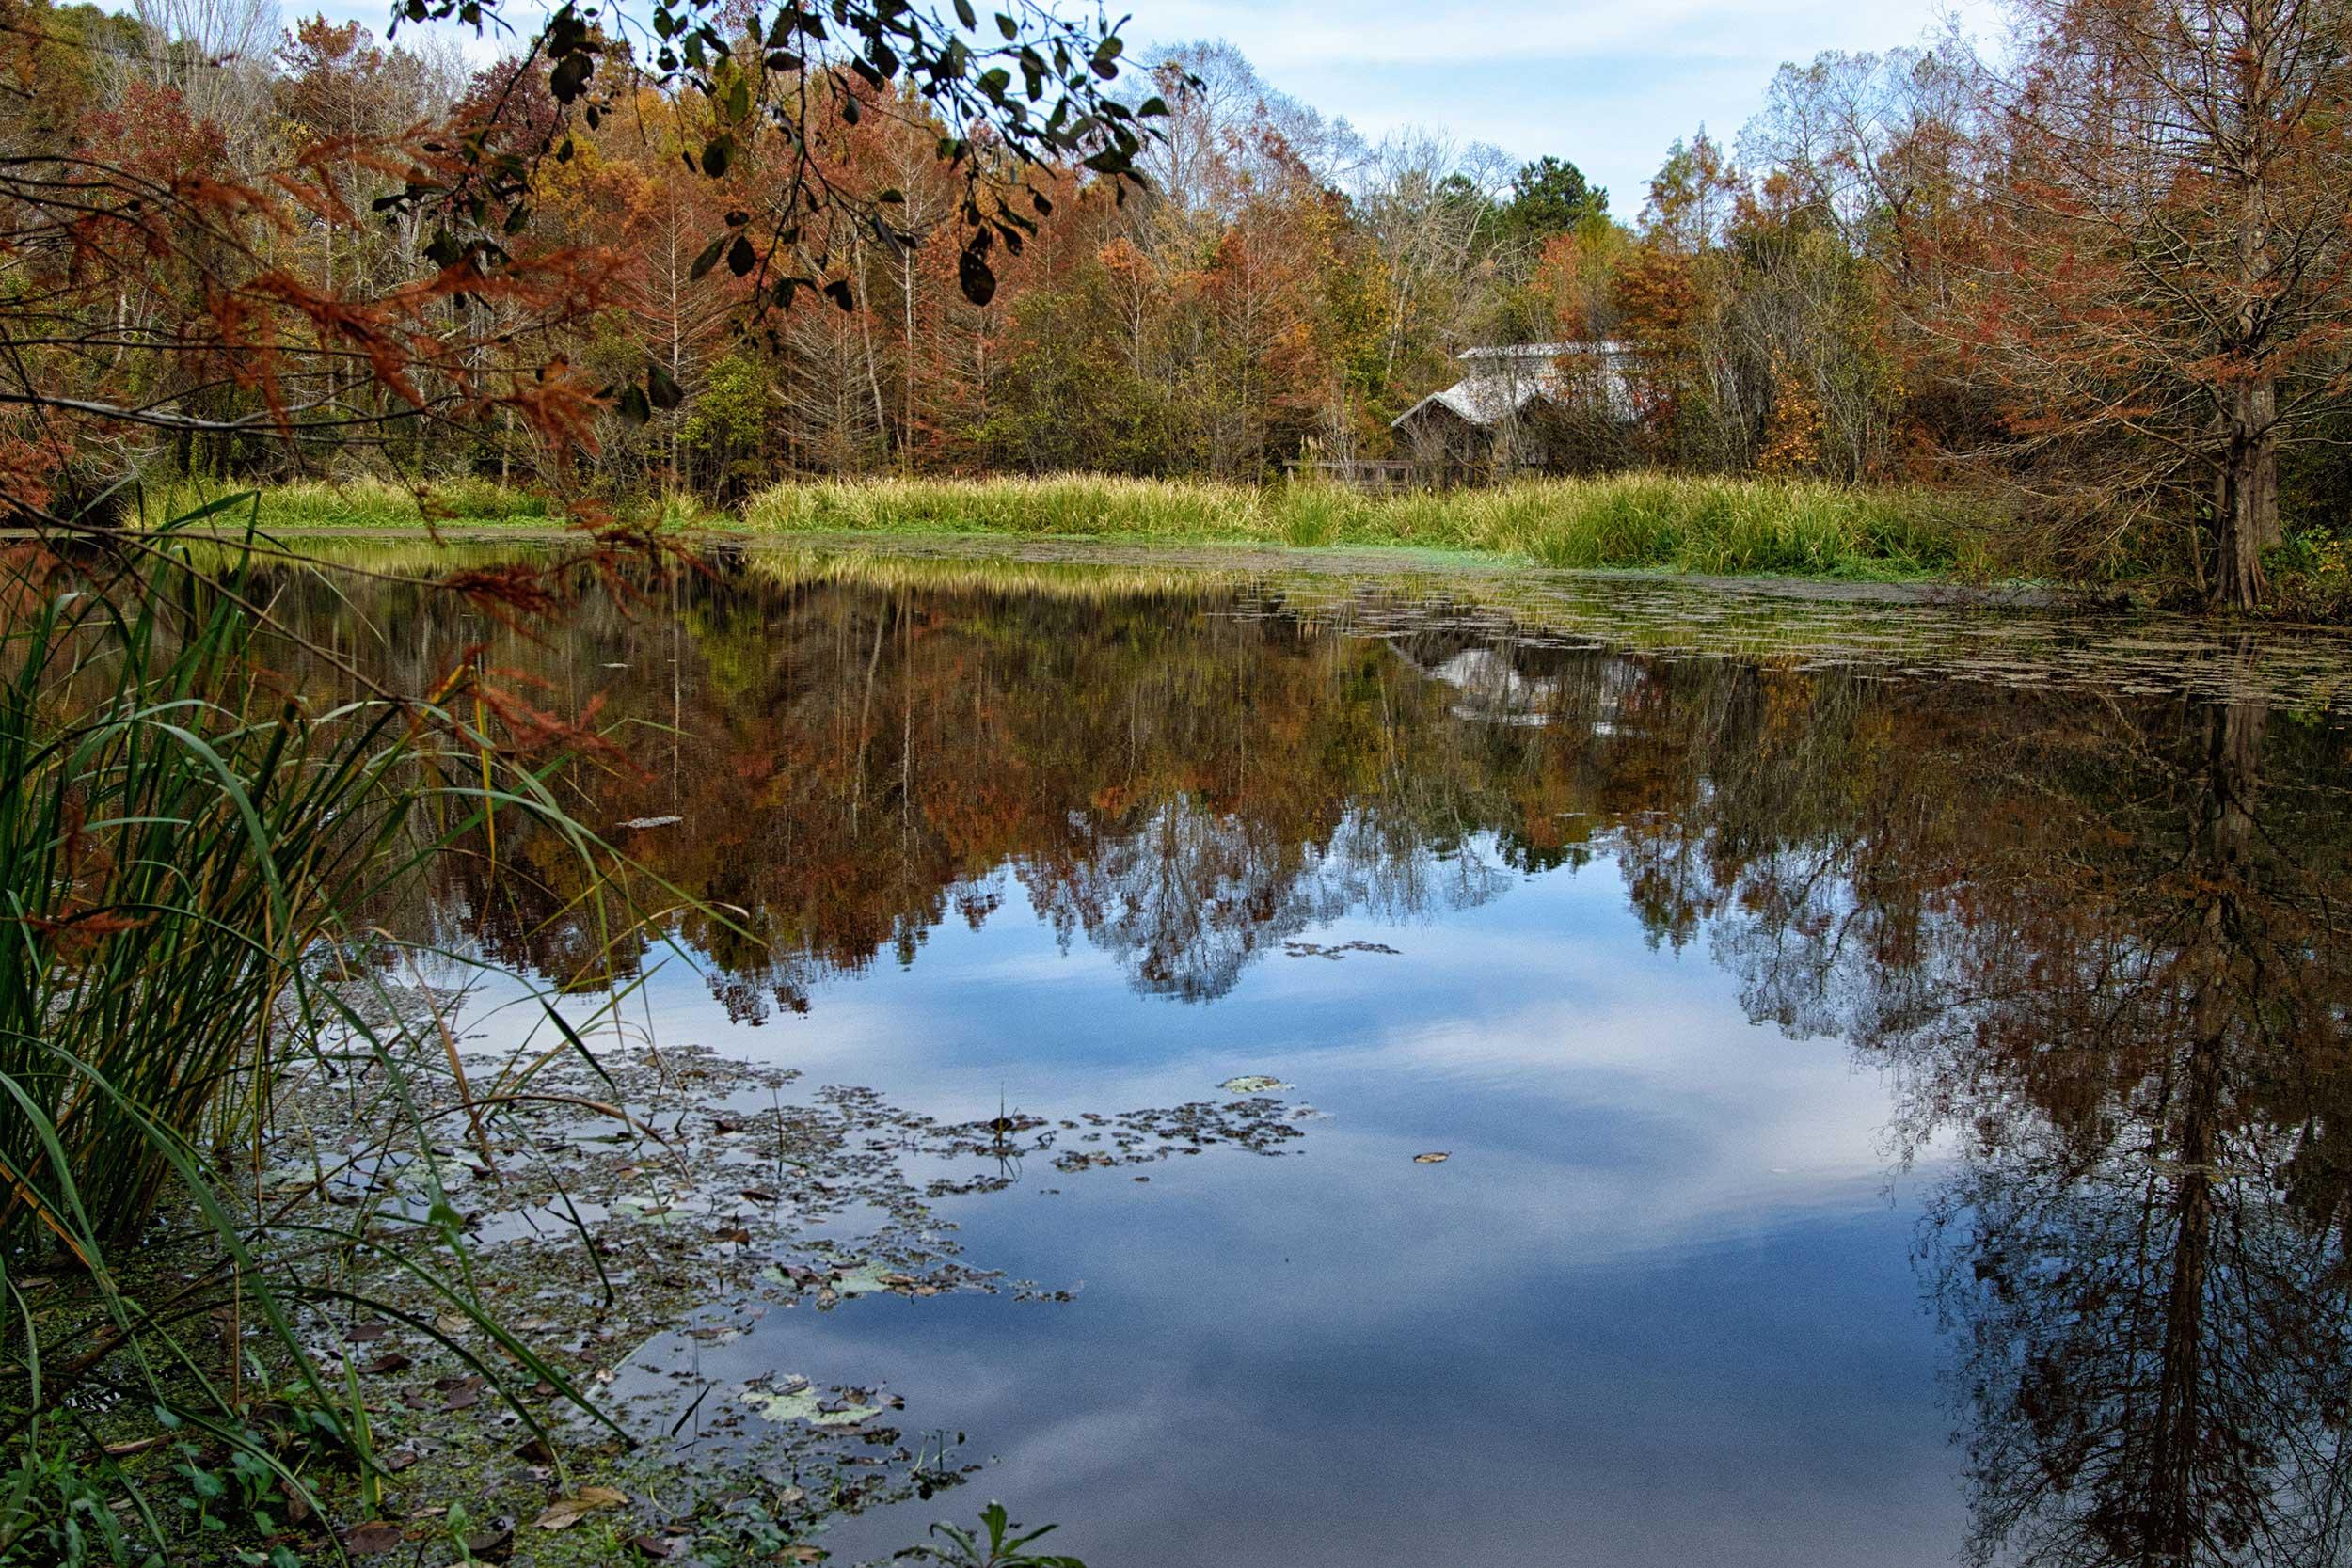 A park facility beside a beautiful pond at Boge Chitto State Park, Washington Parish, Louisiana.